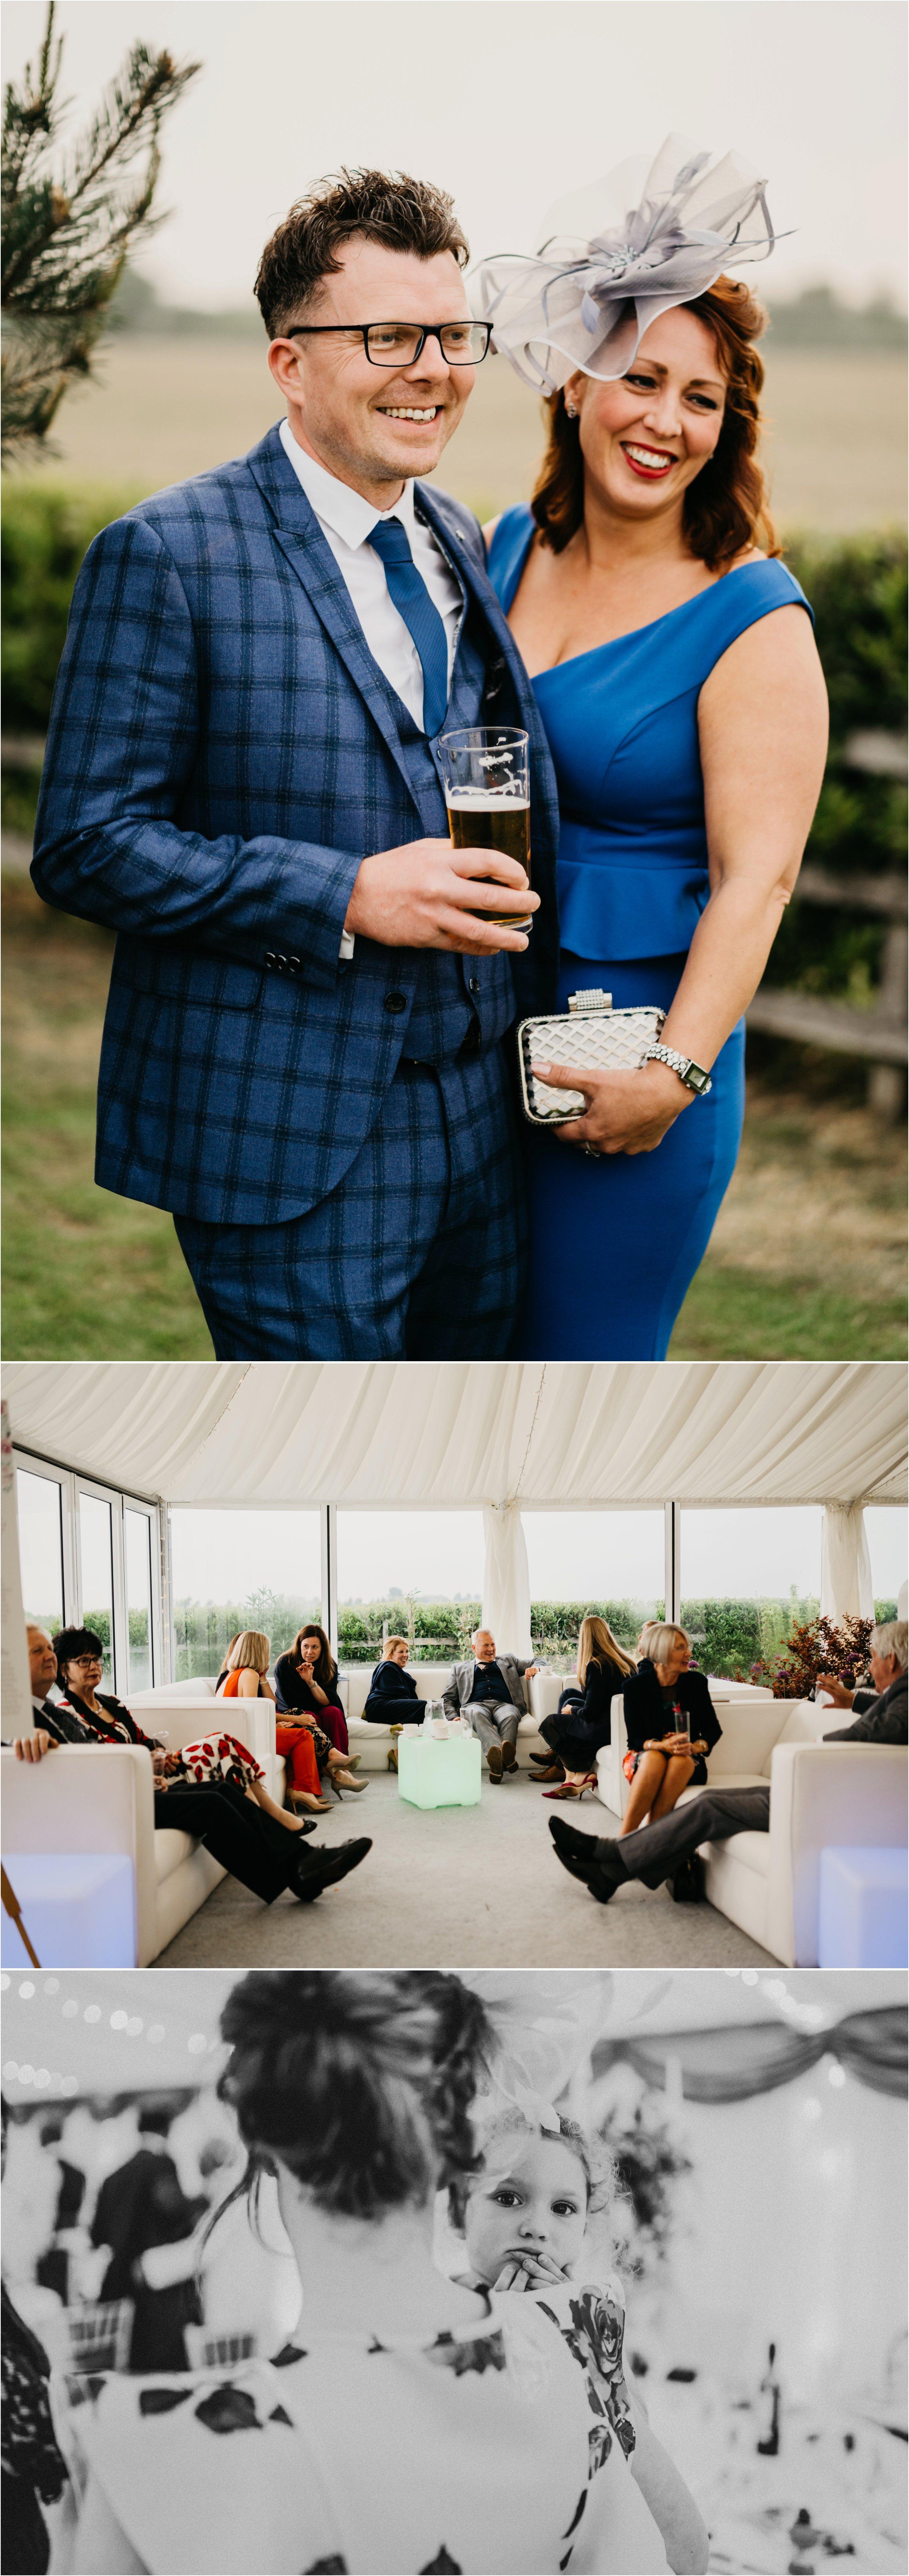 Lincolnshire wedding photography_0161.jpg